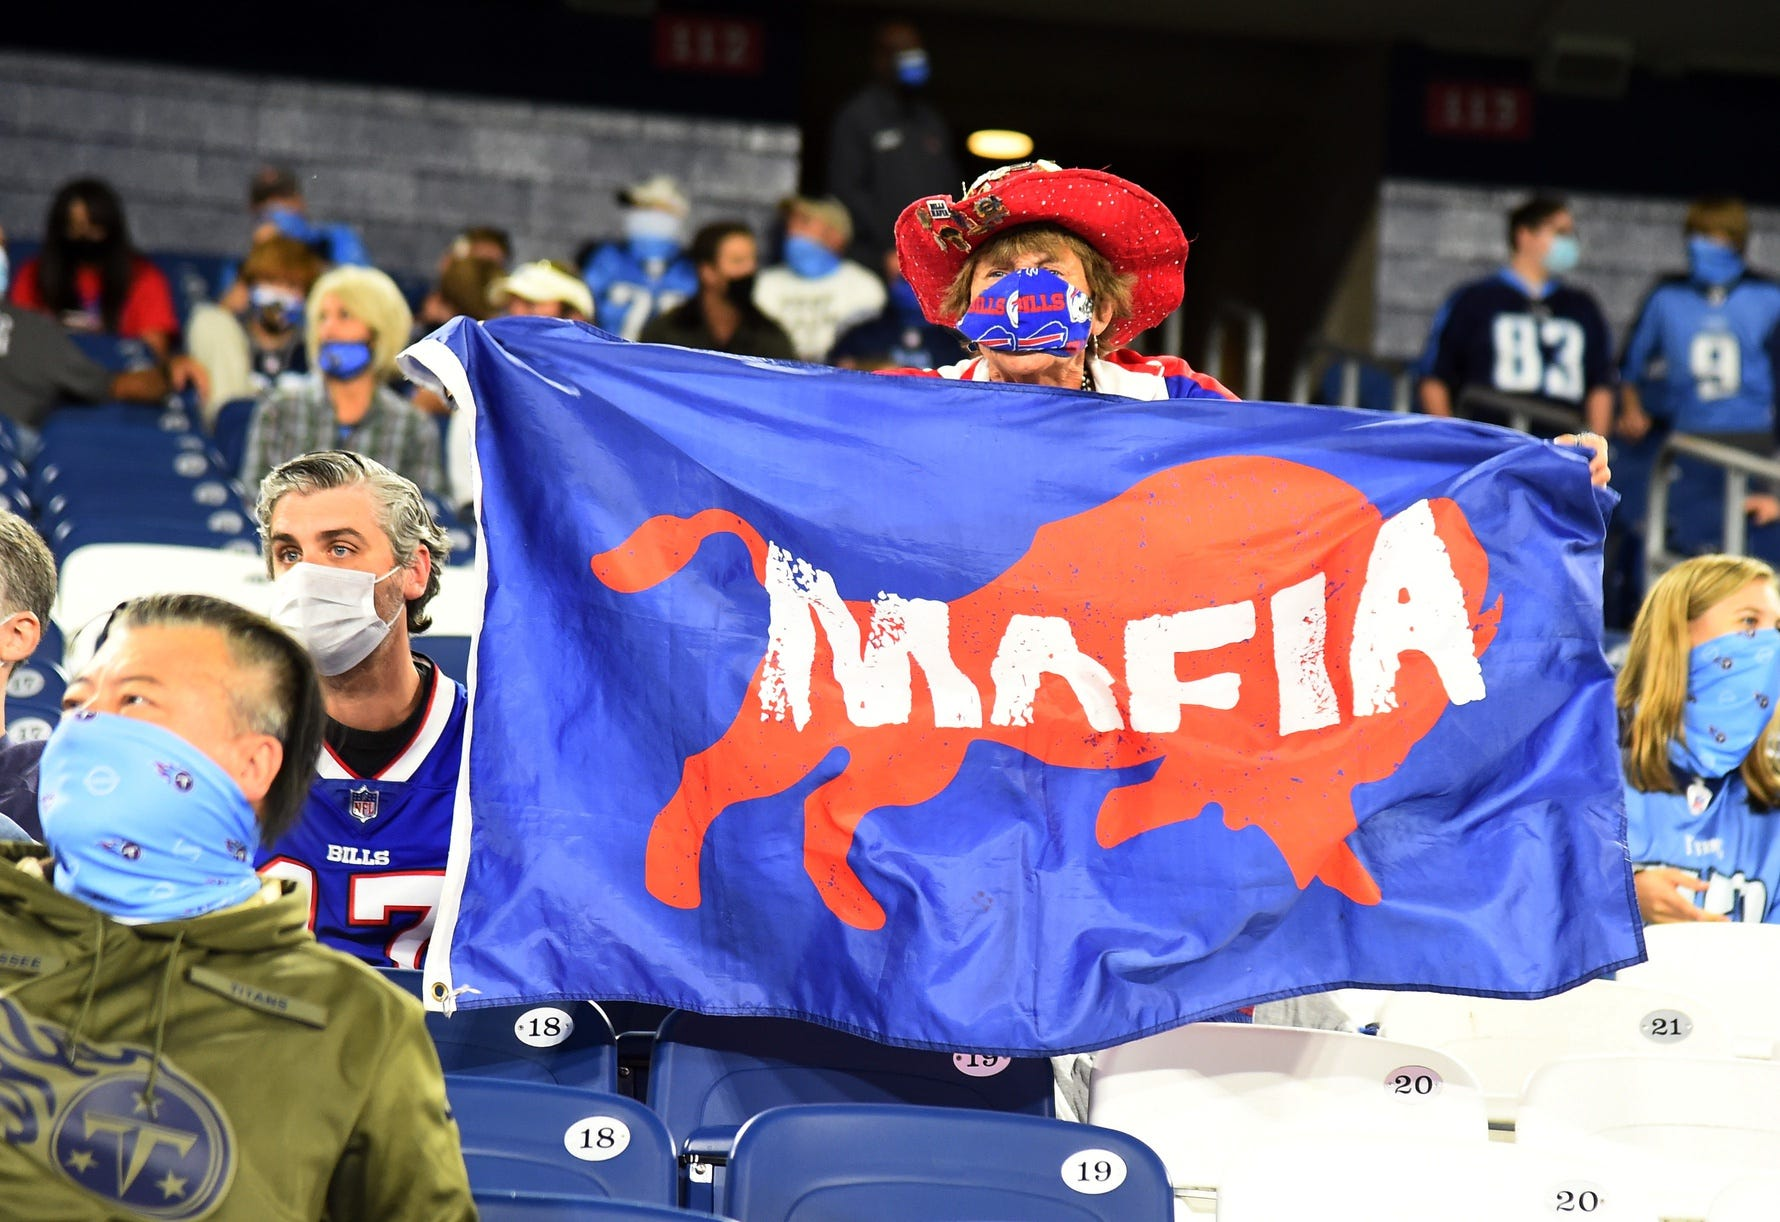 Buffalo dealership trolls Cam Newton, Patriots with billboard